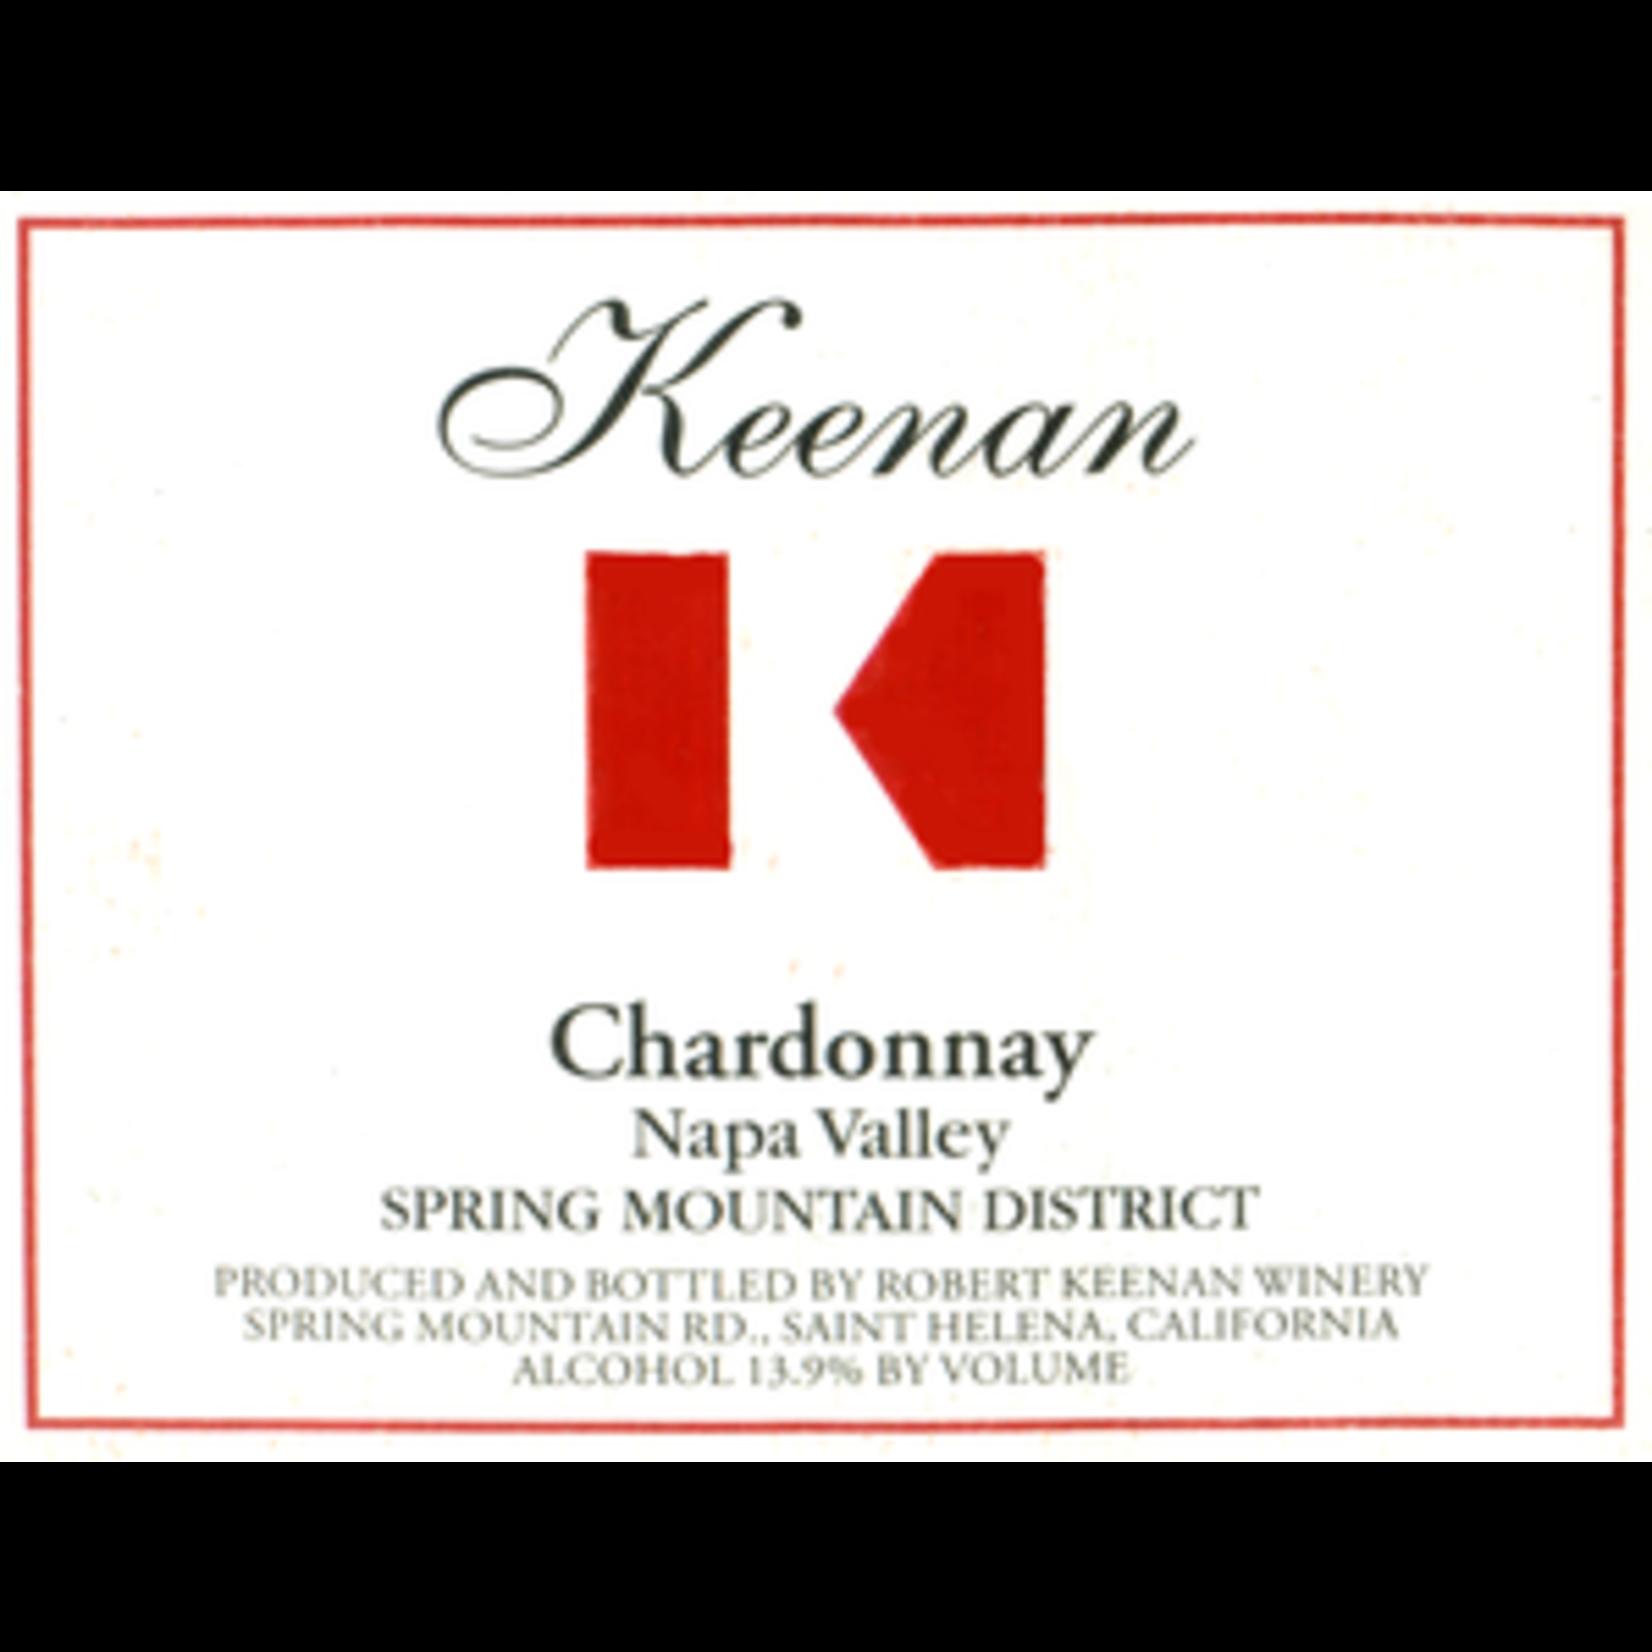 Wine Keenan Chardonnay Spring Mountain District  2018